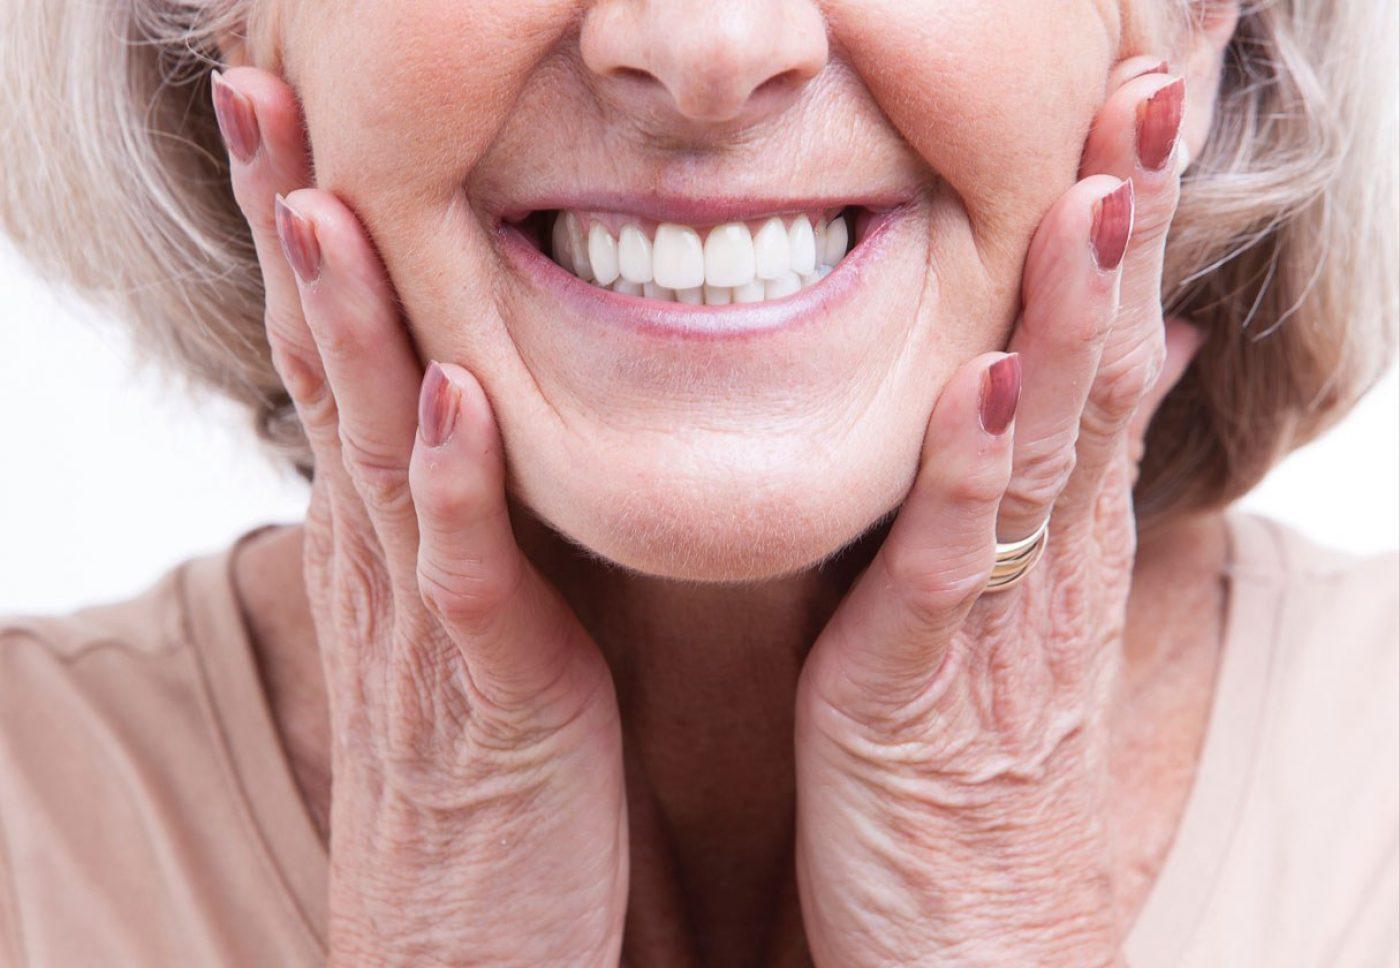 Aston Clinton Replacing Teeth Dentures